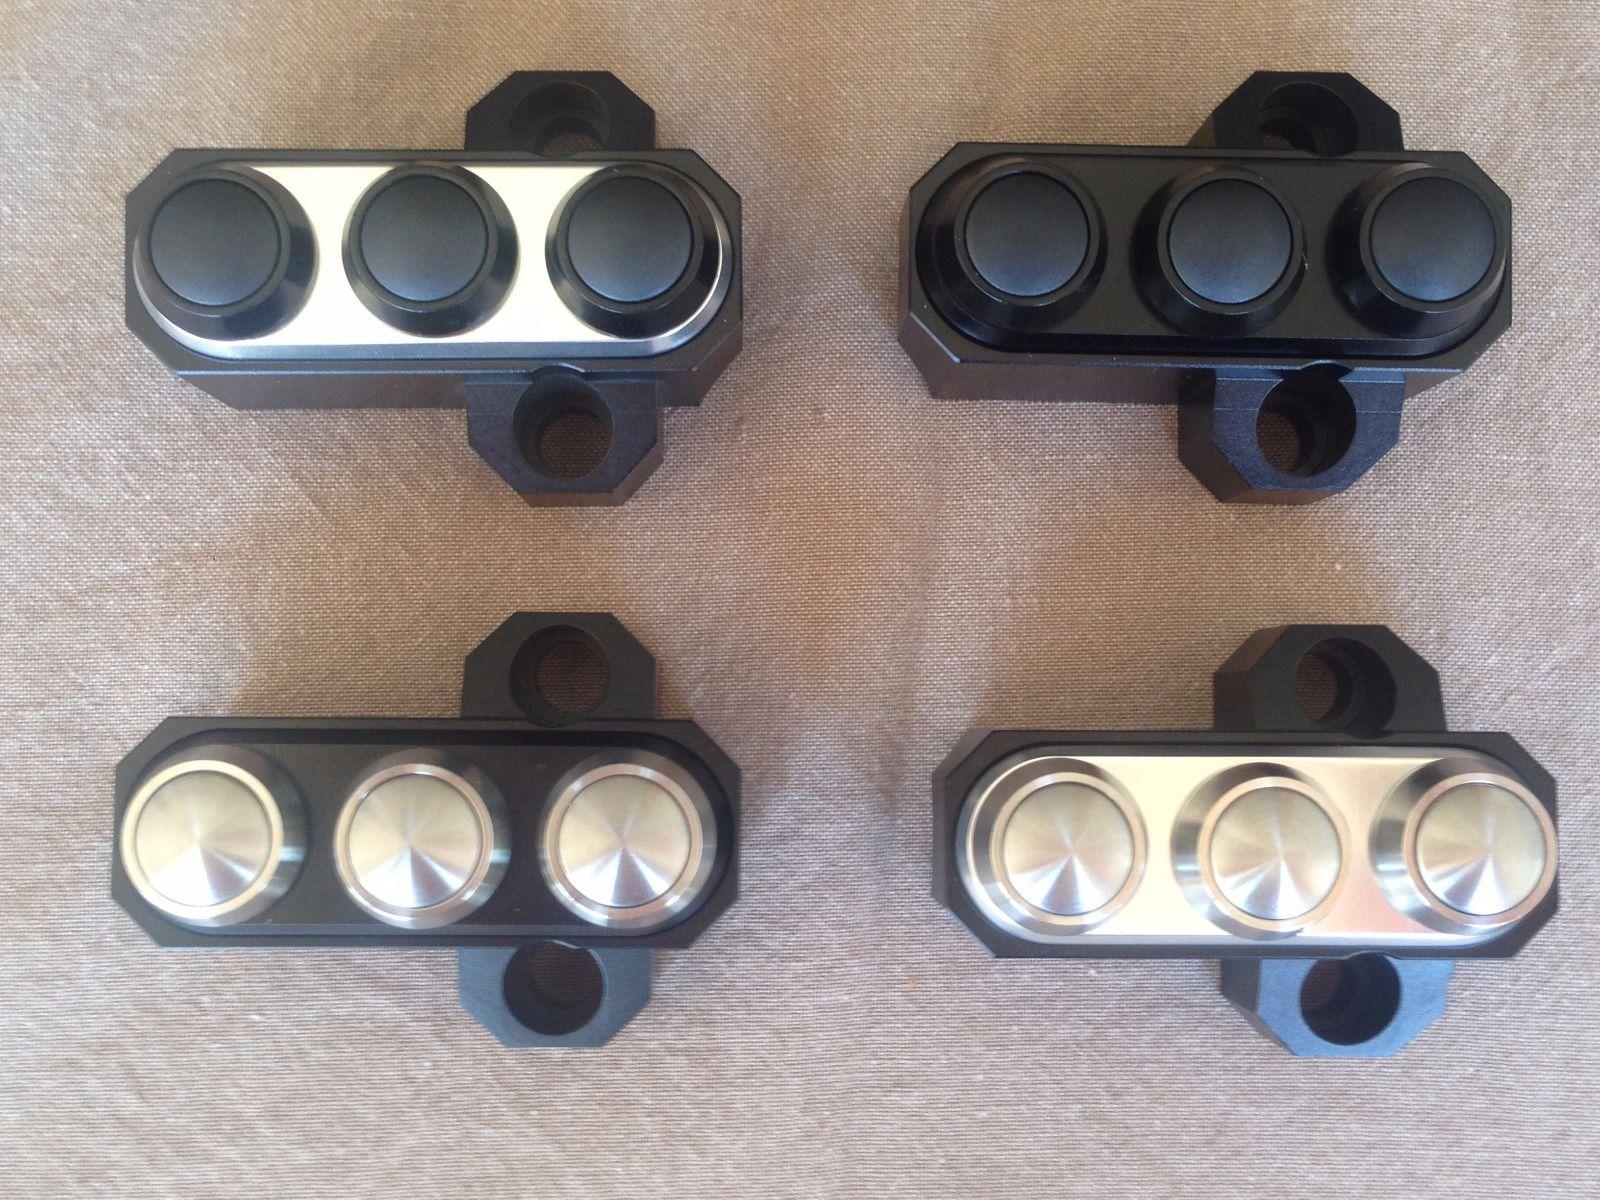 http://www.ebay.de/itm/E-2x-CNC-Lenkerschalter-Armatur-Taster ...